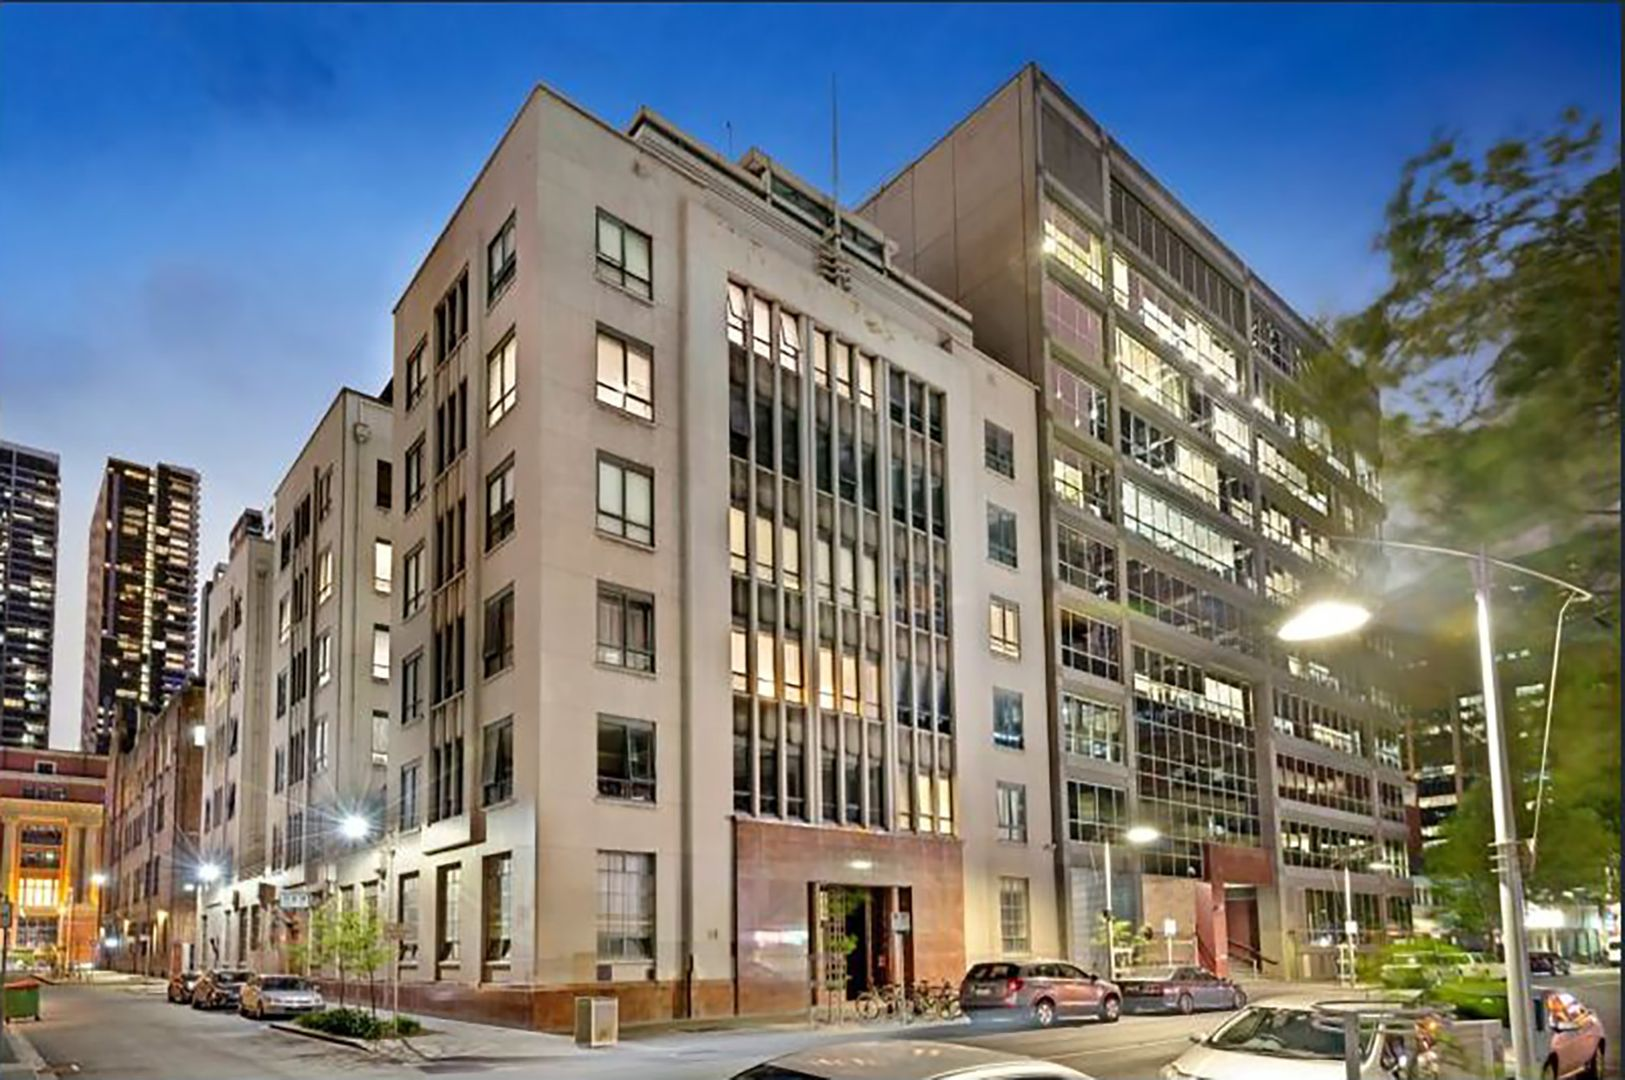 2 bedrooms Apartment / Unit / Flat in 406/616 Little Collins Street MELBOURNE VIC, 3000